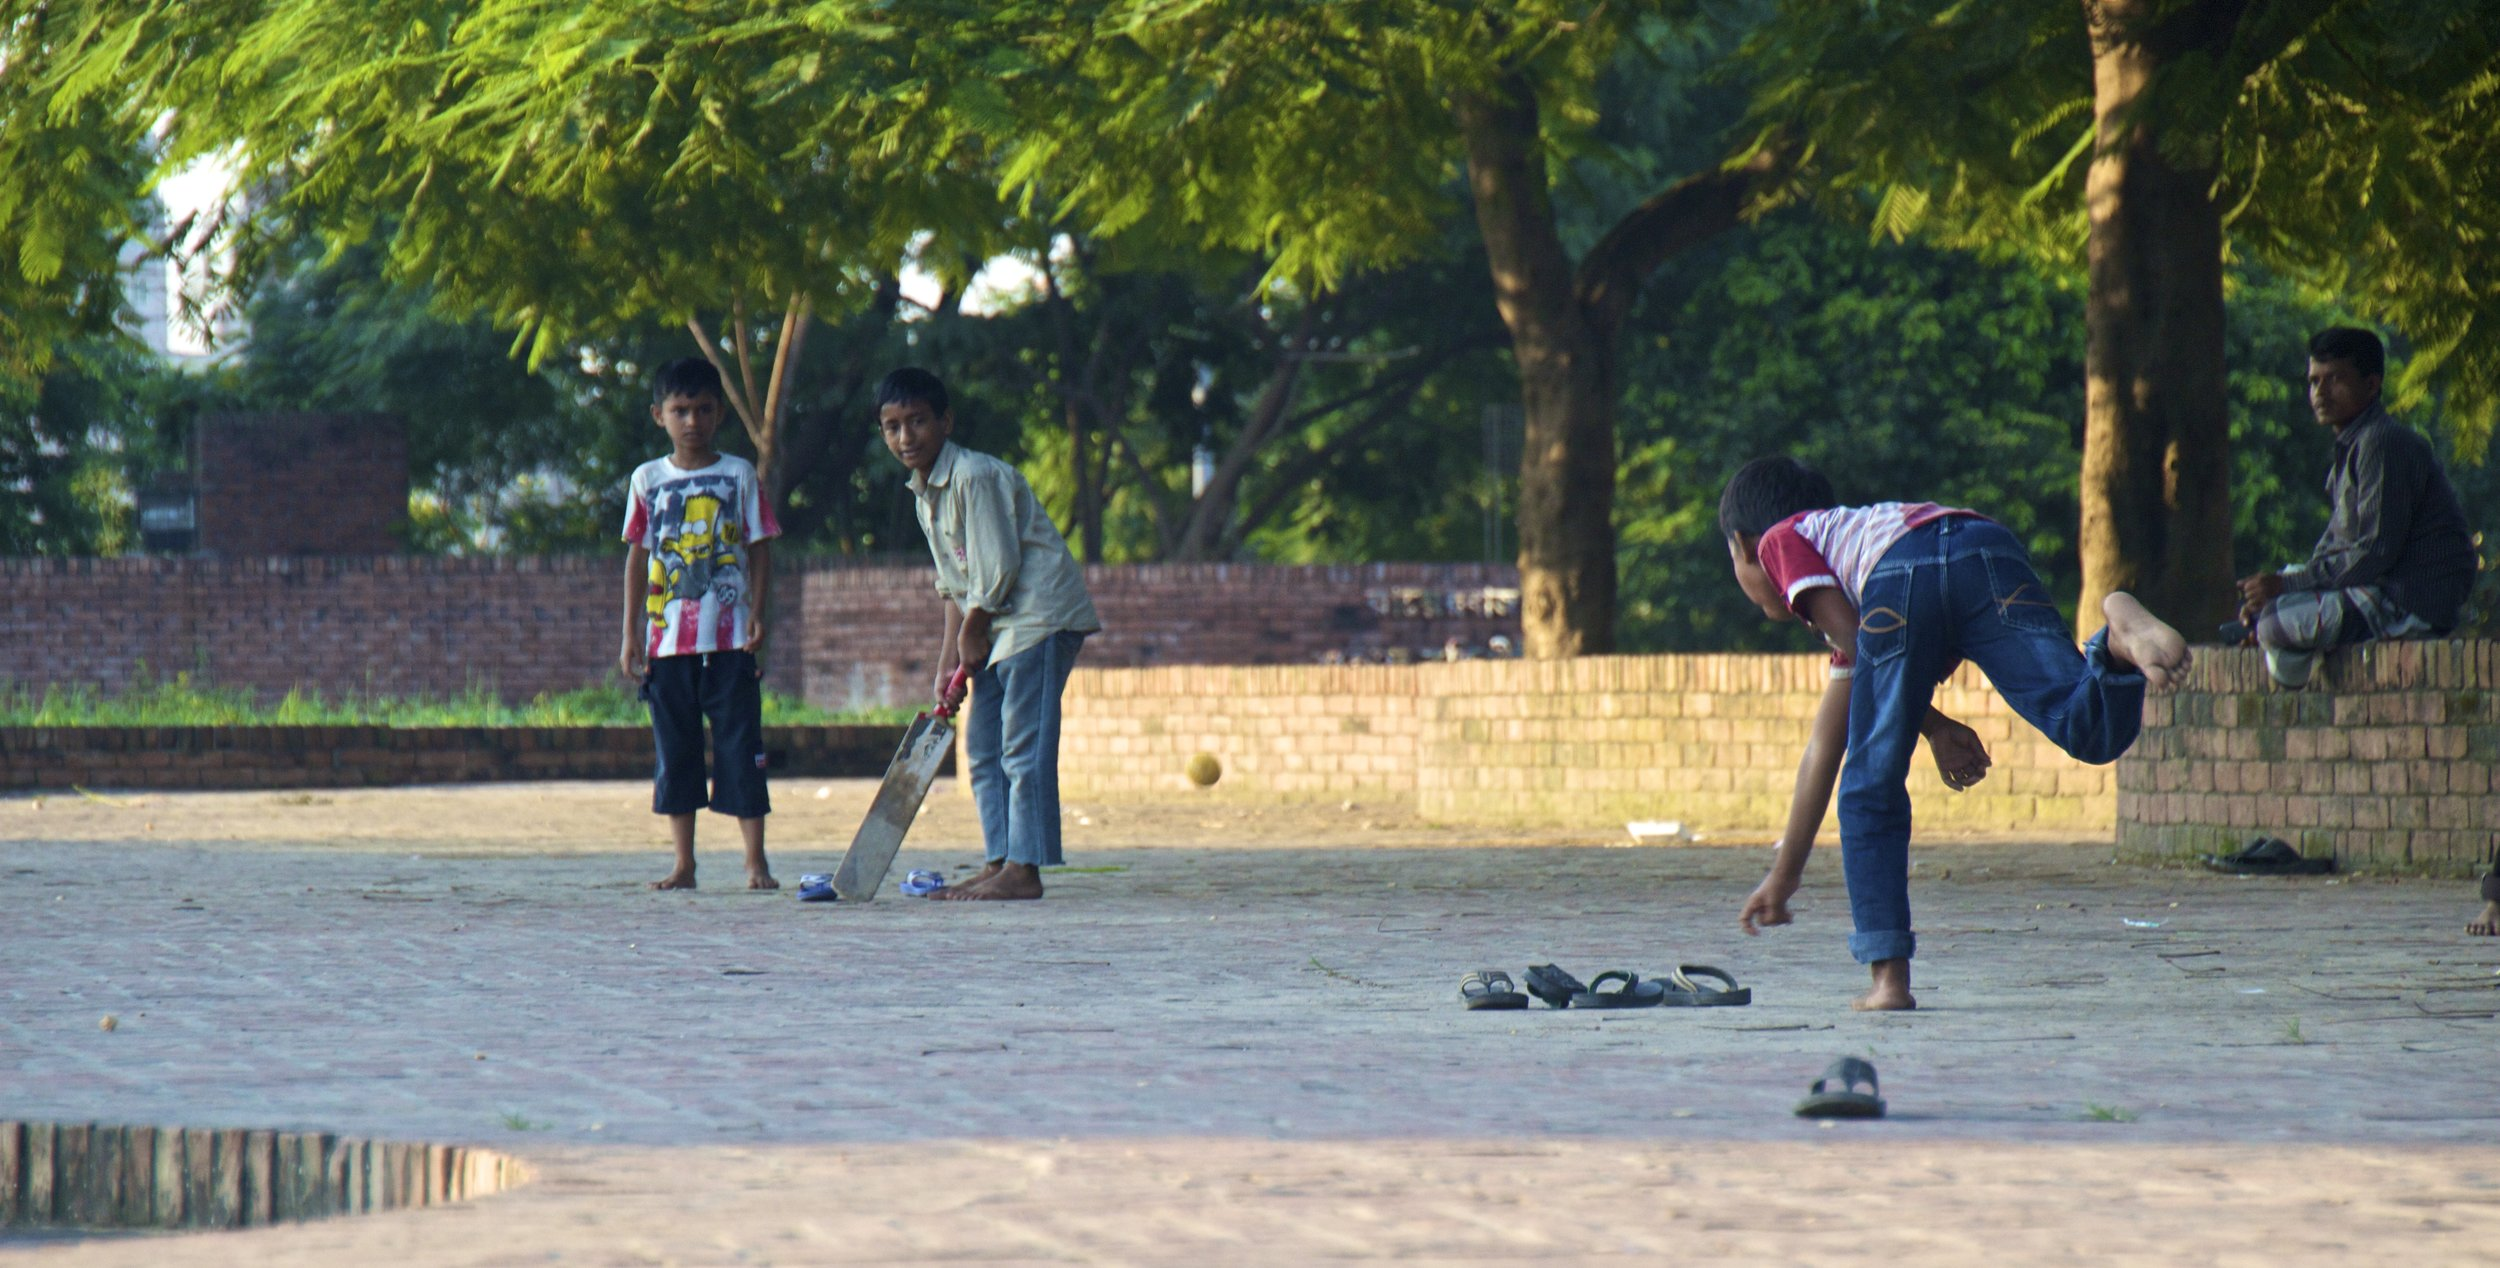 rayer bazar dhaka children playing cricket 4.jpg